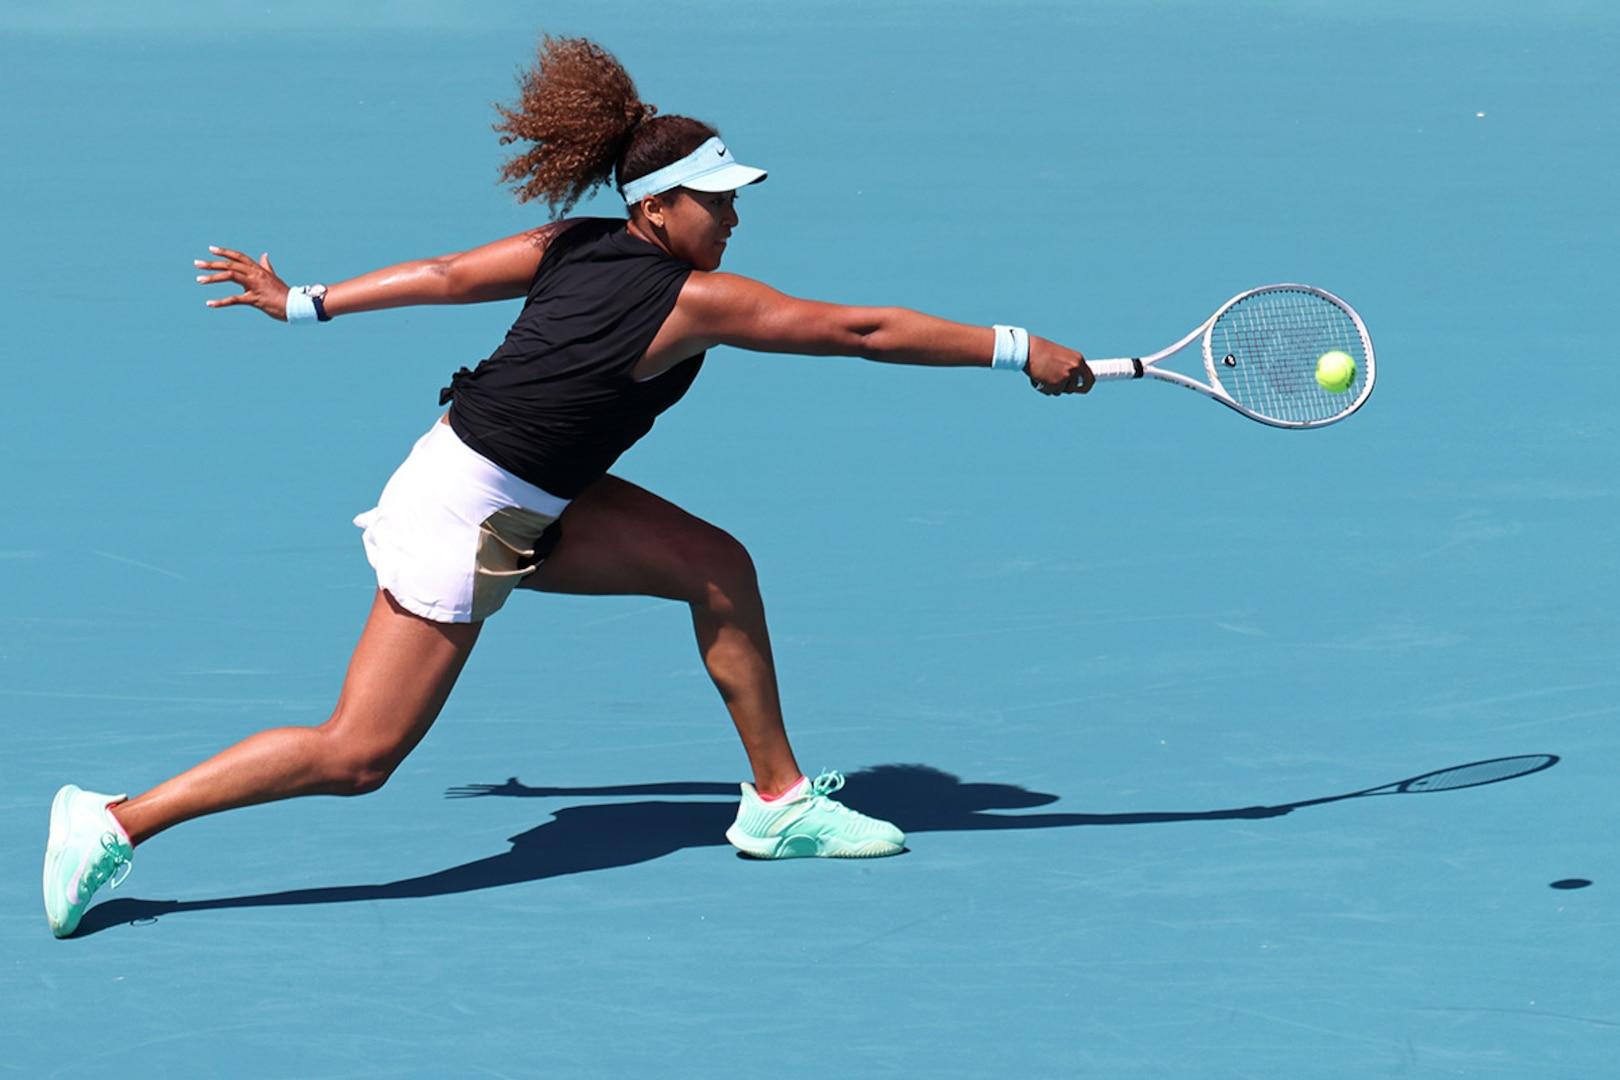 Naomi Osaka reaches for a backhand hit during a tennis match